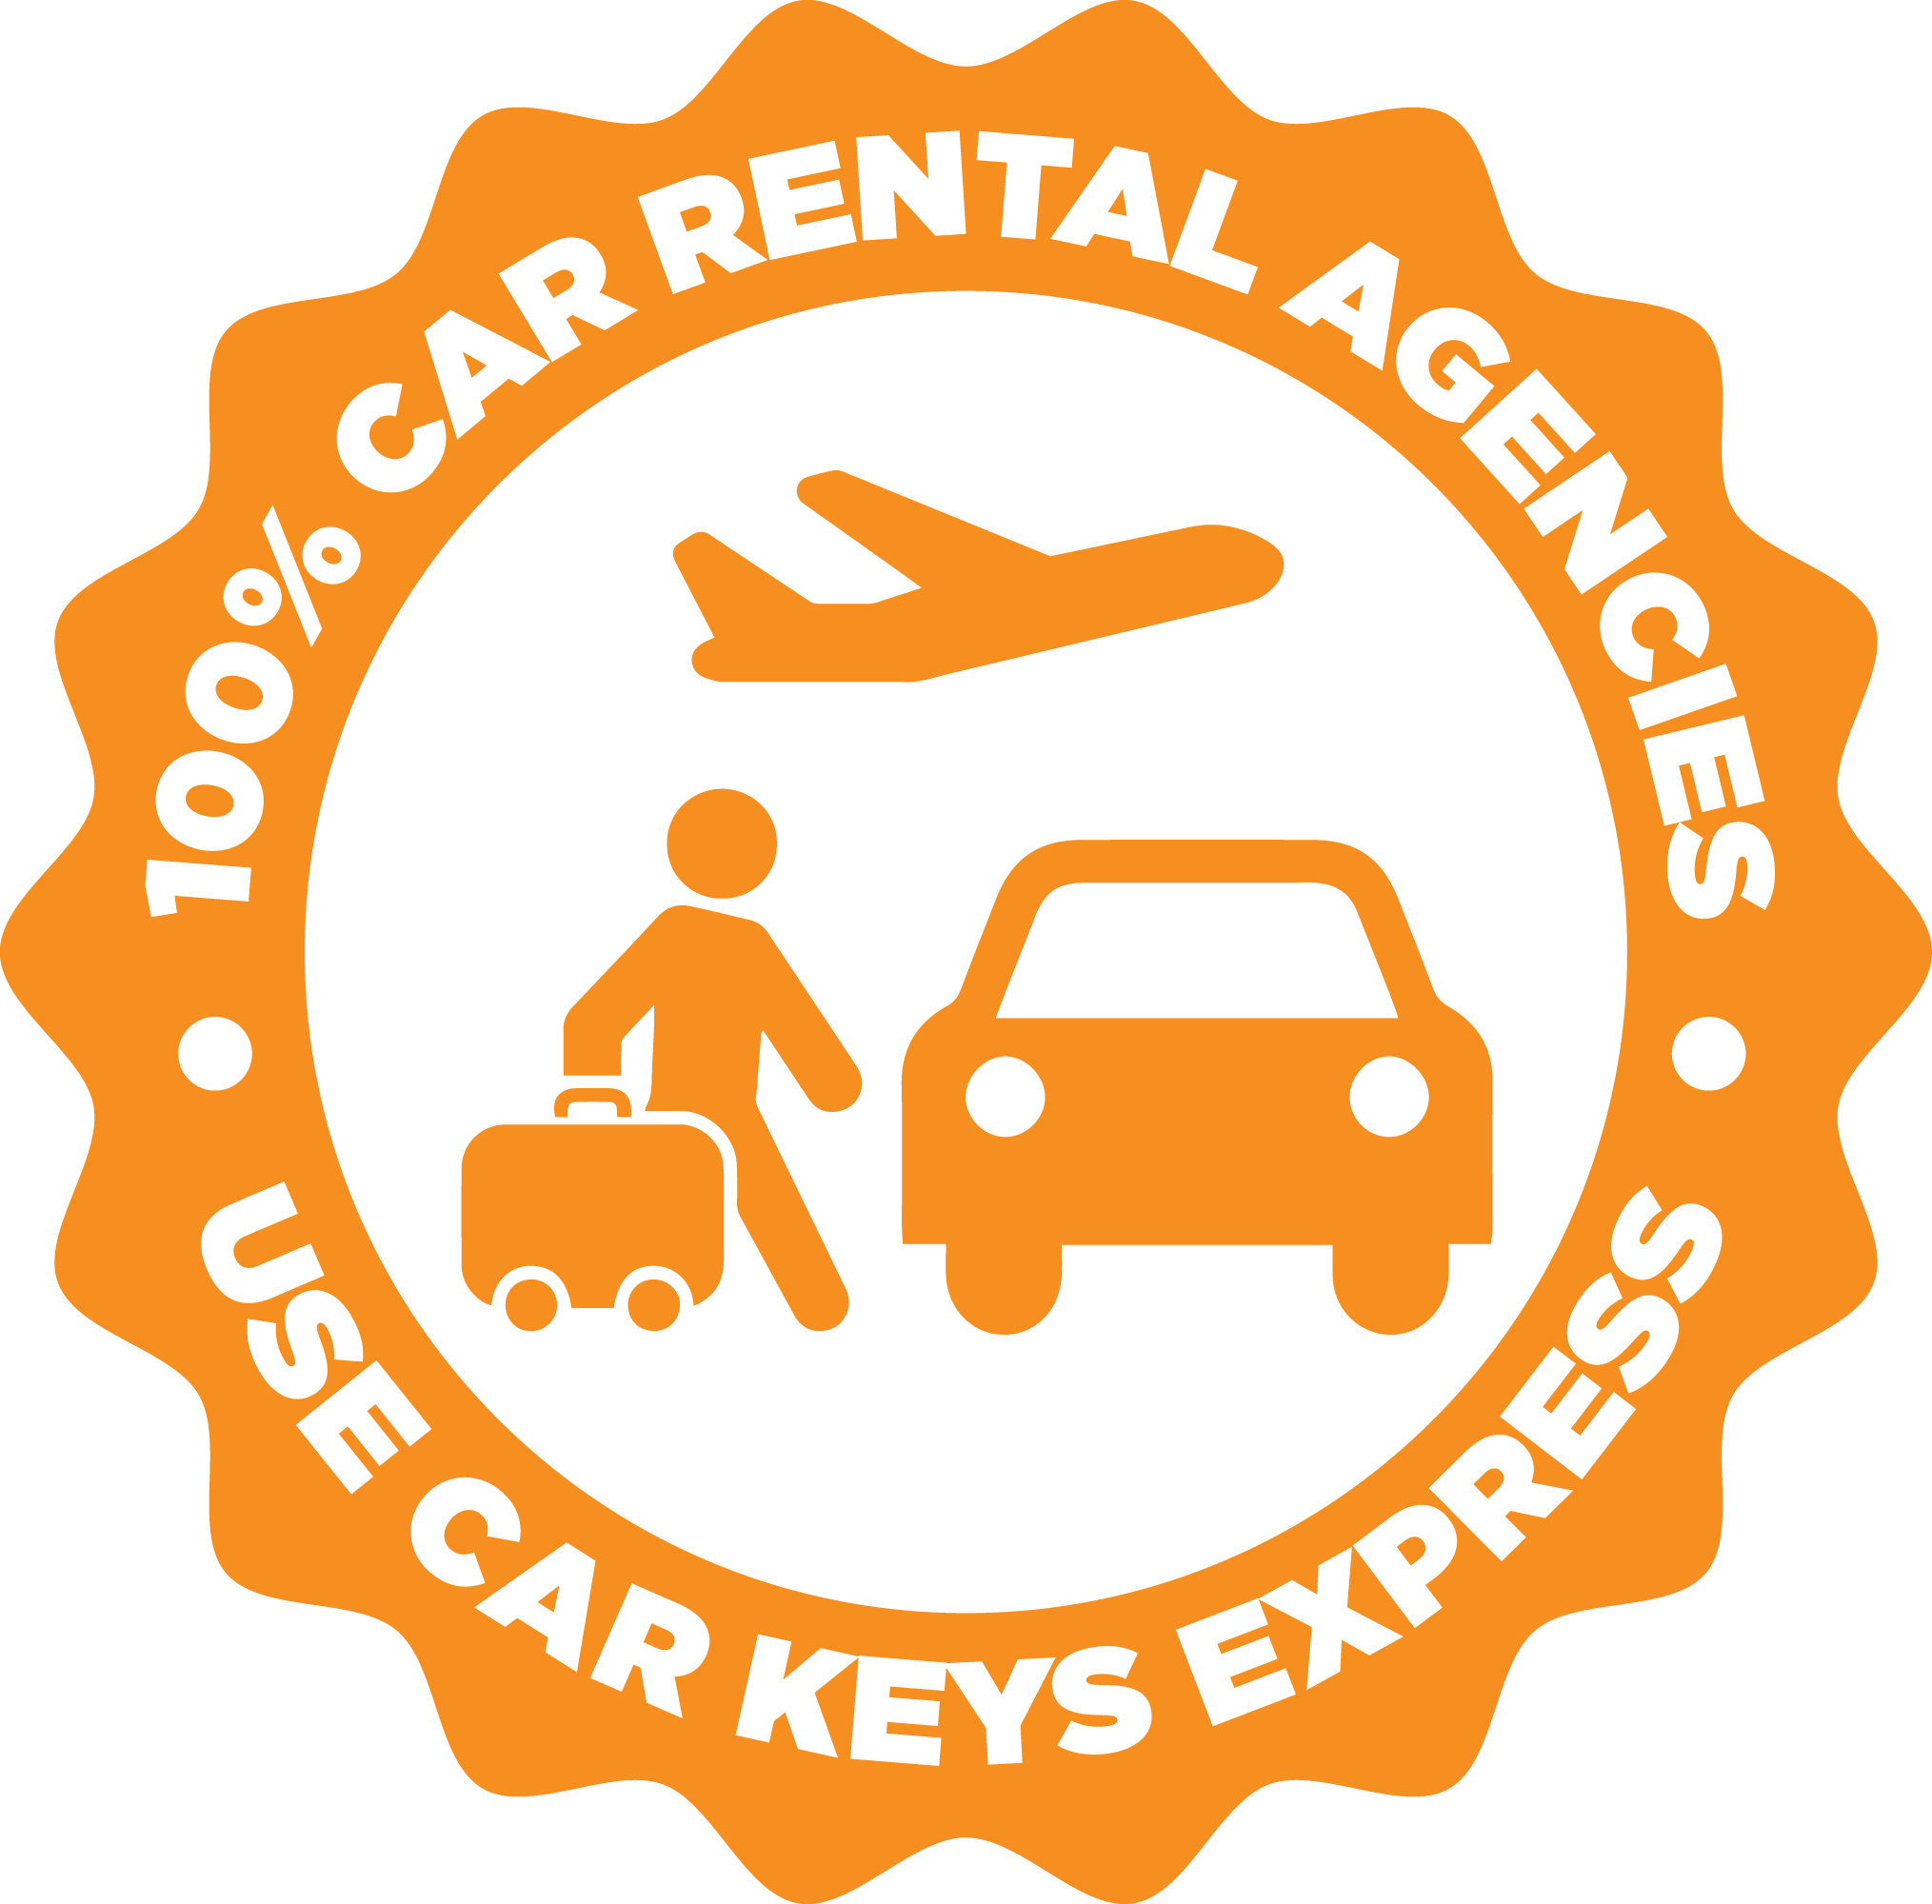 100% of major dealership groups use CarKeysExpress